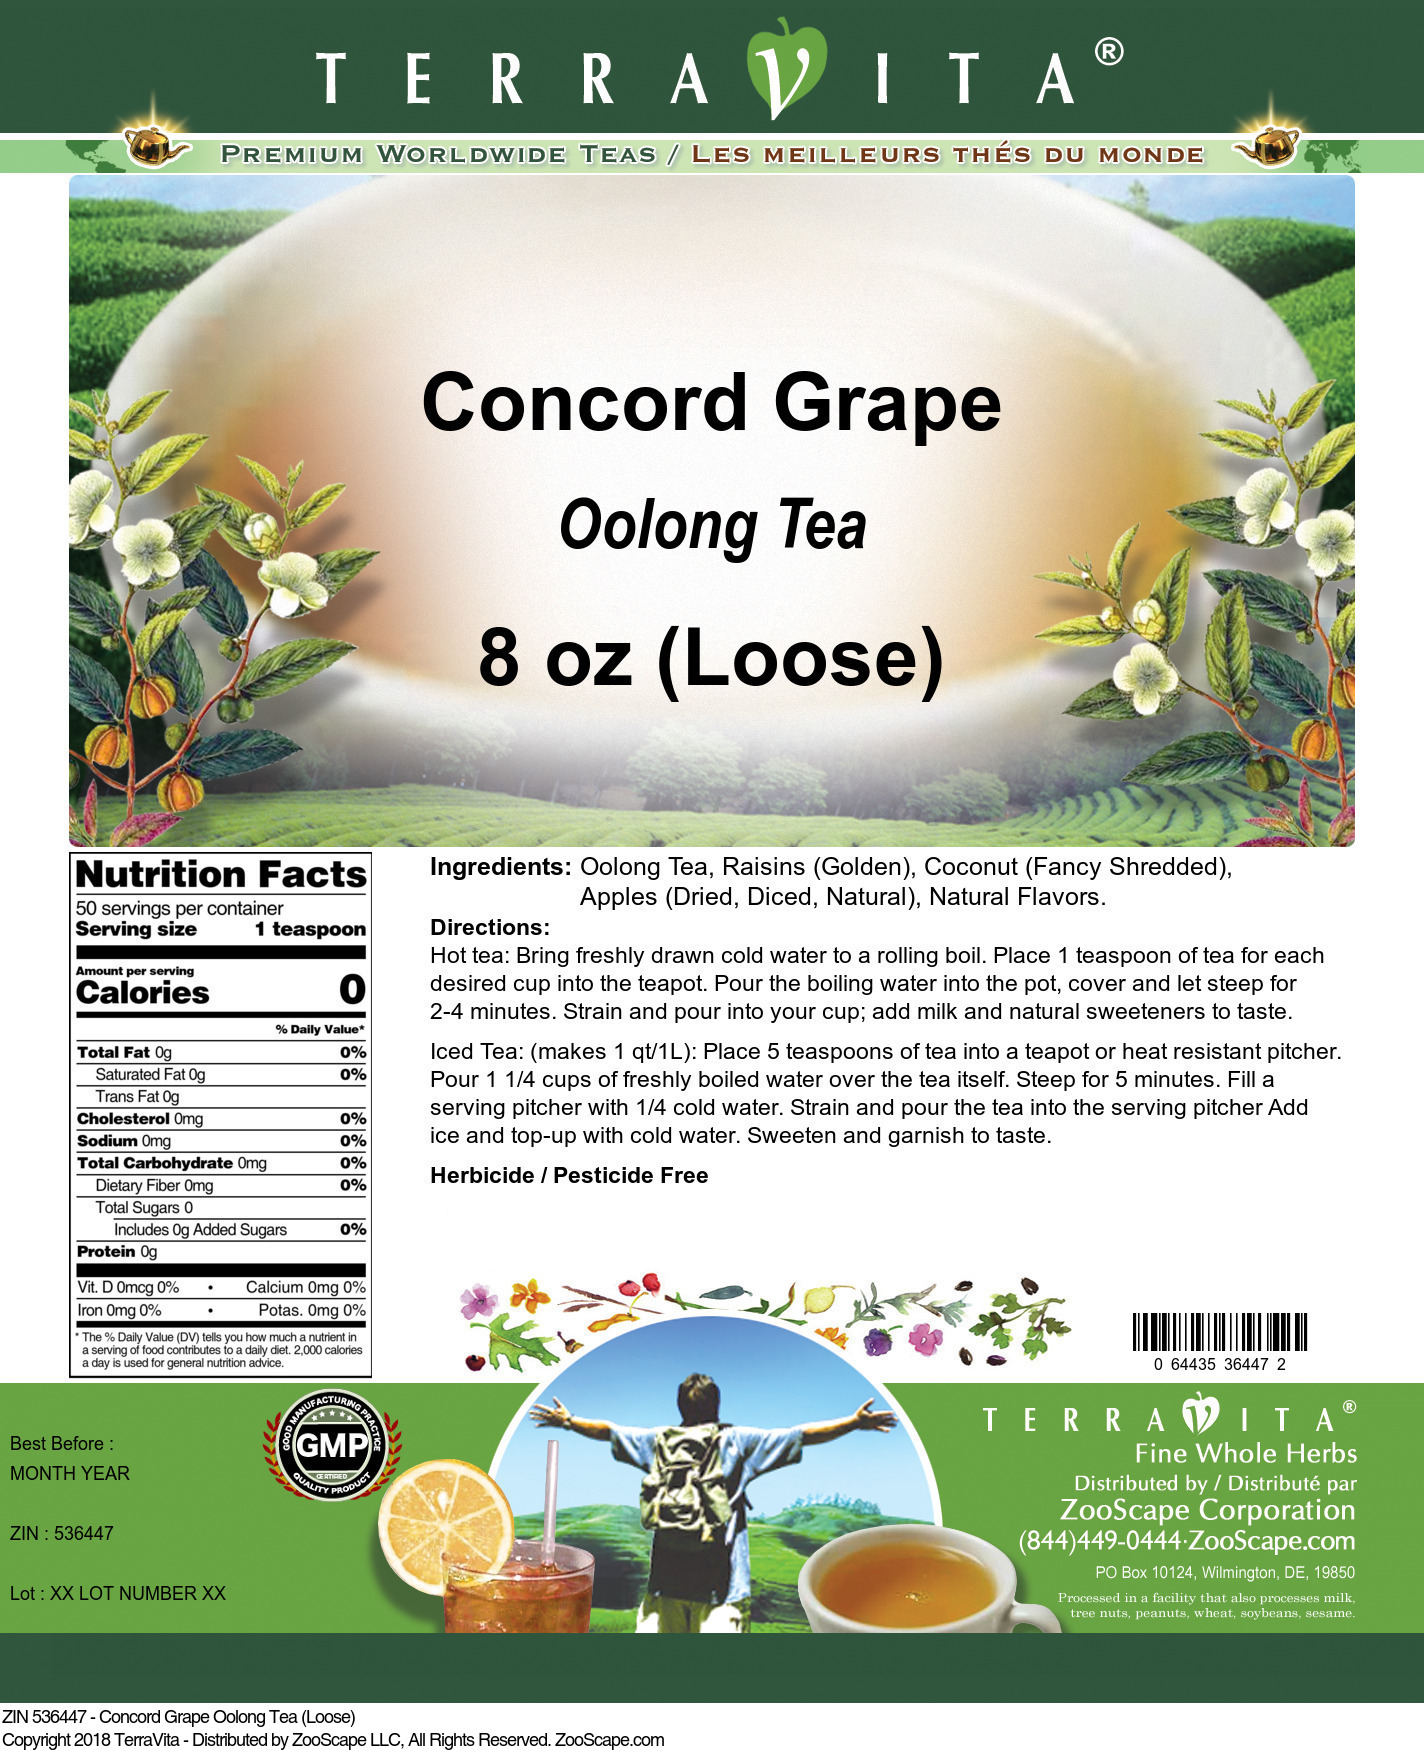 Concord Grape Oolong Tea